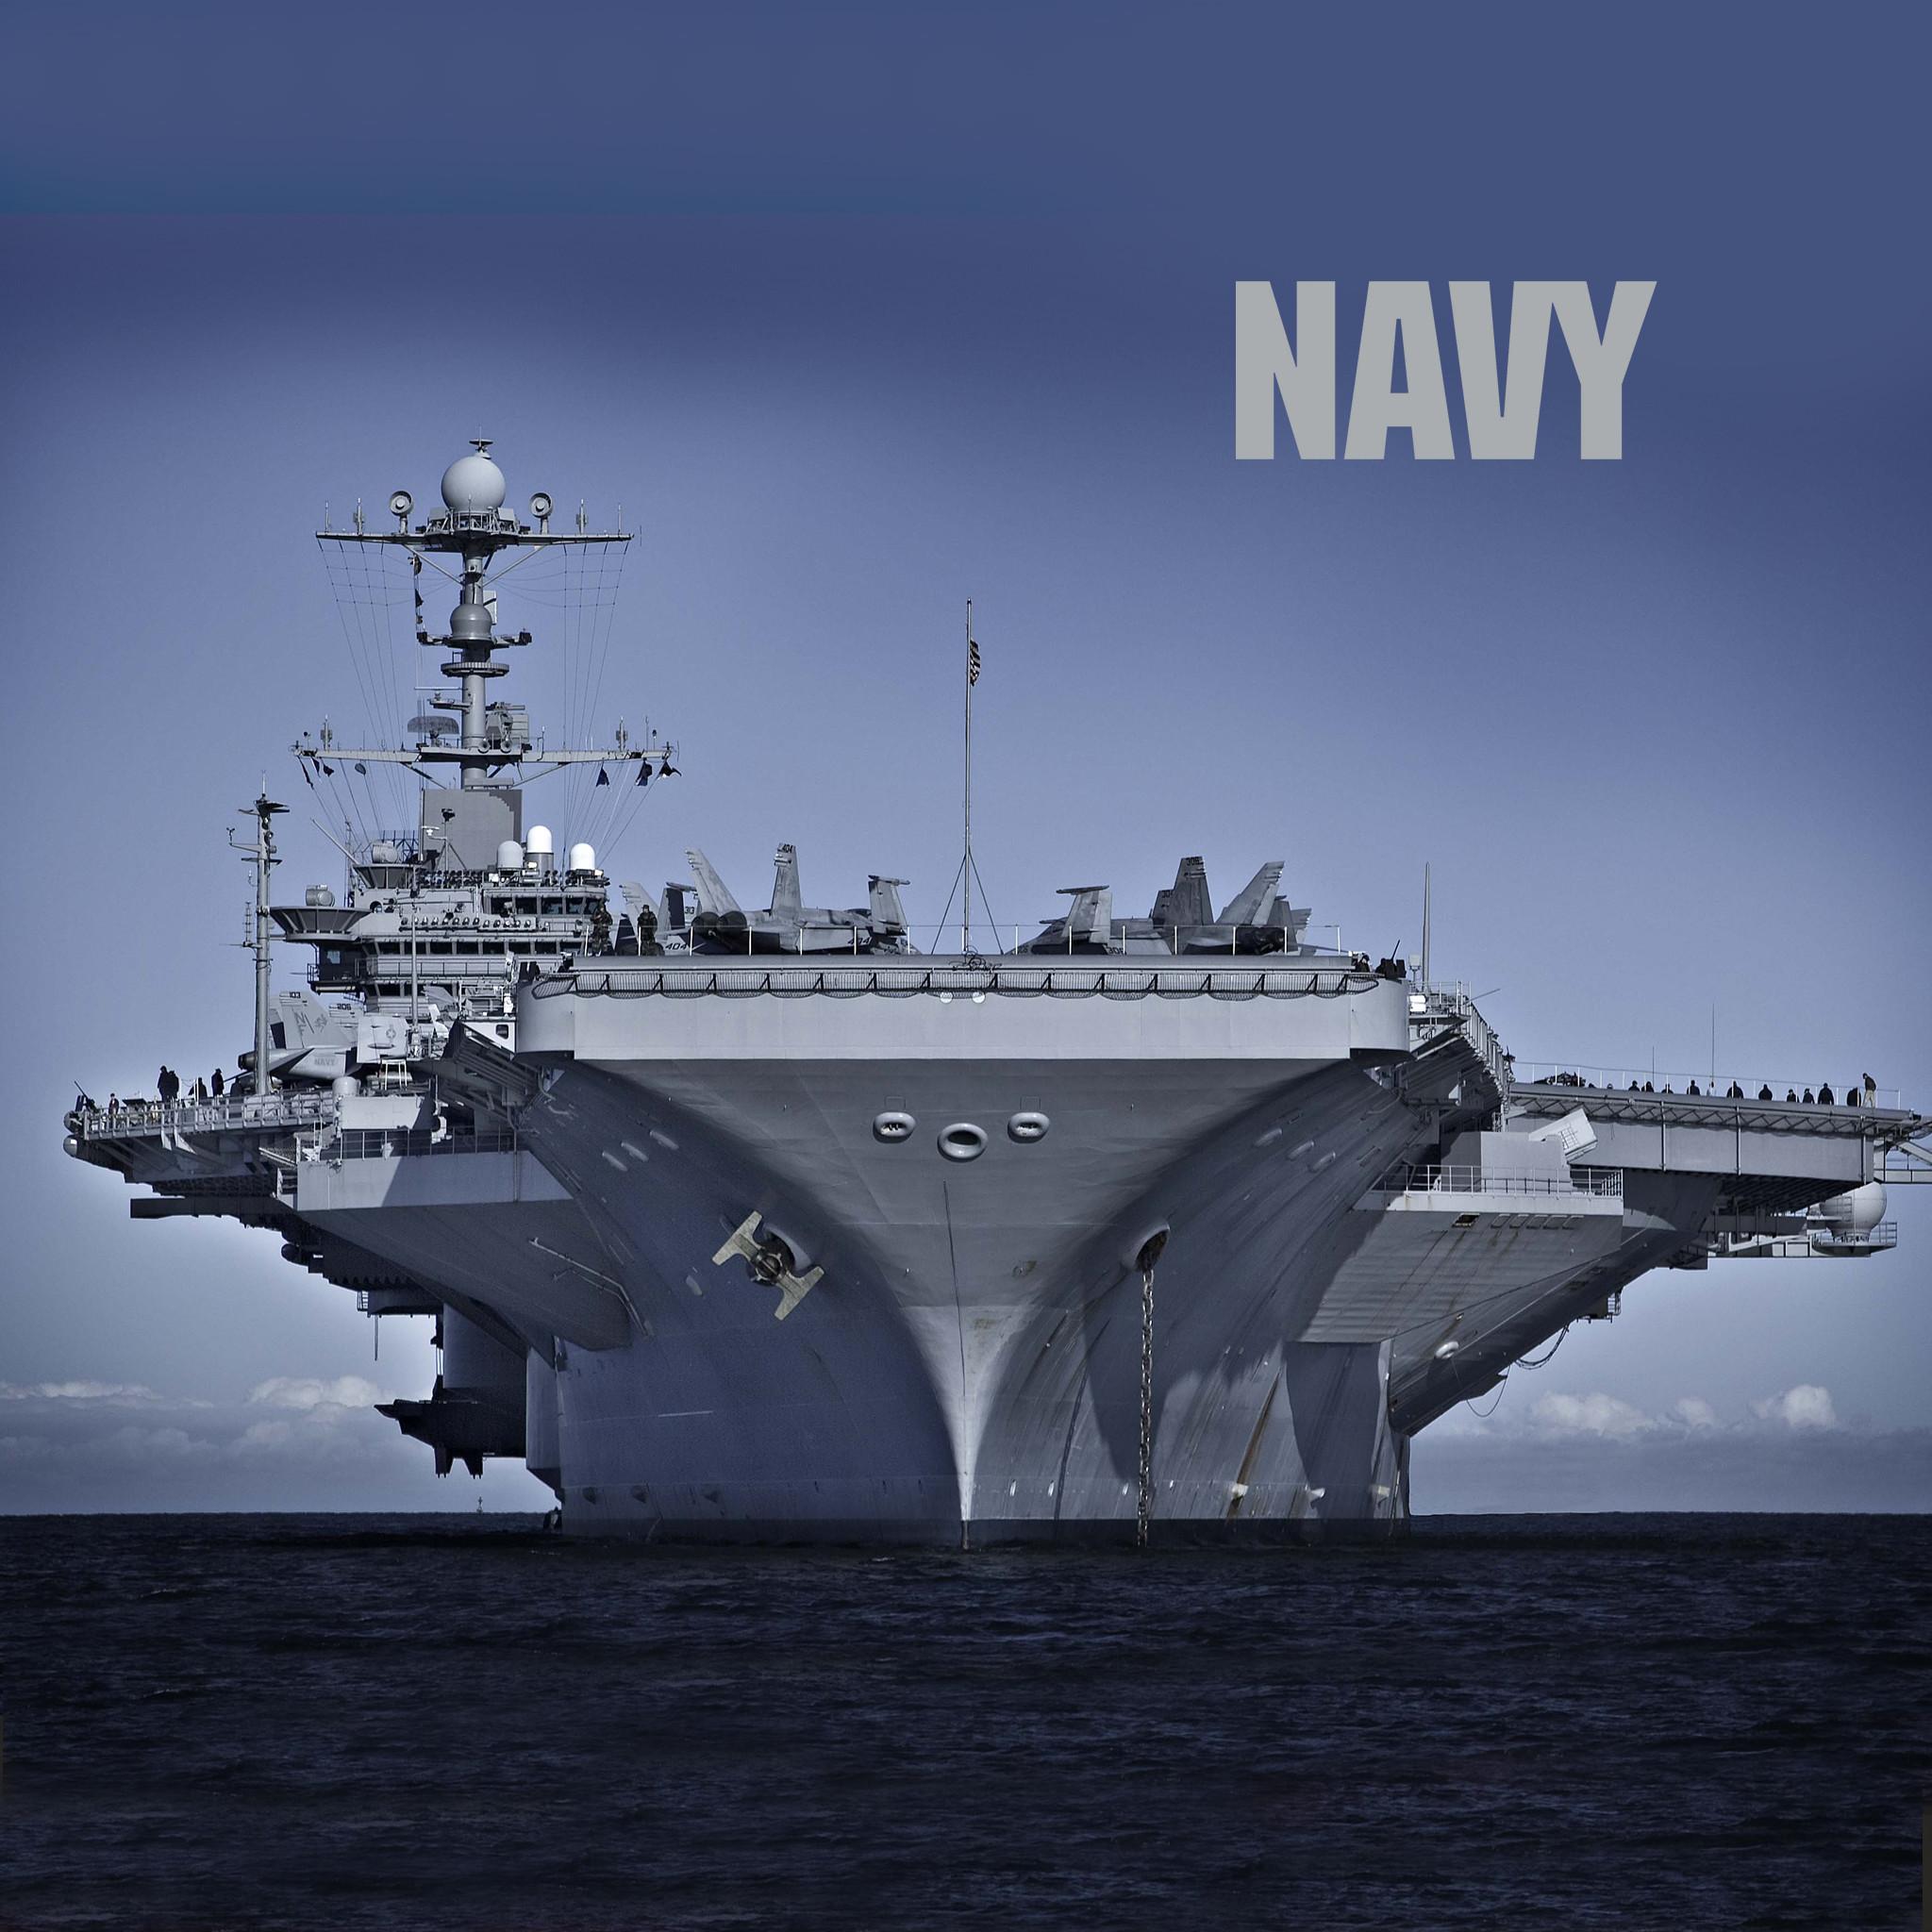 Cool US Navy Wallpaper